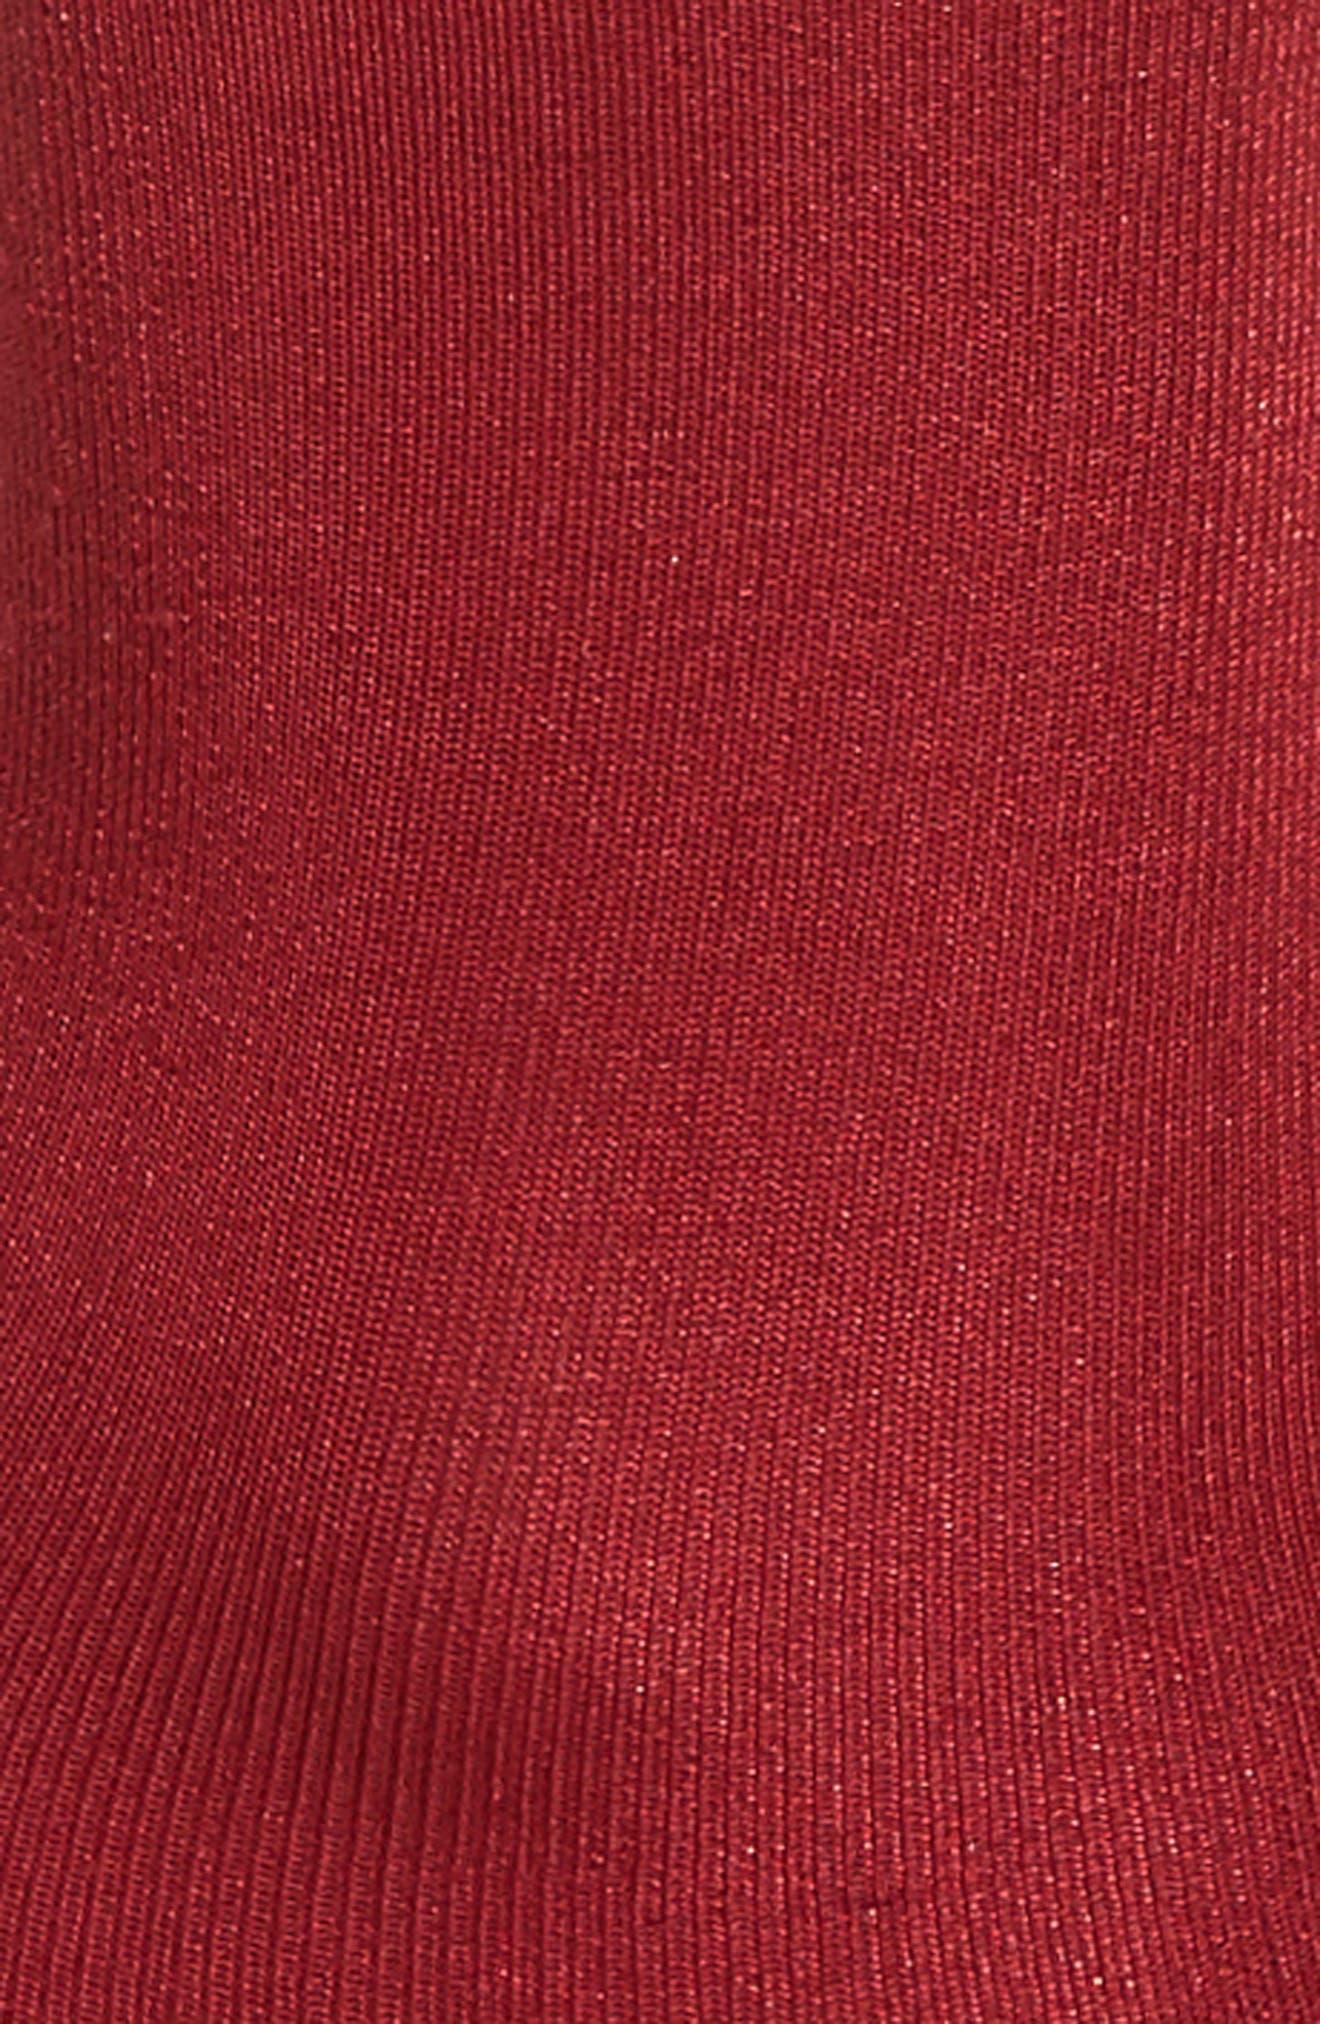 Ruffled Luster Socks,                             Alternate thumbnail 2, color,                             Sangria